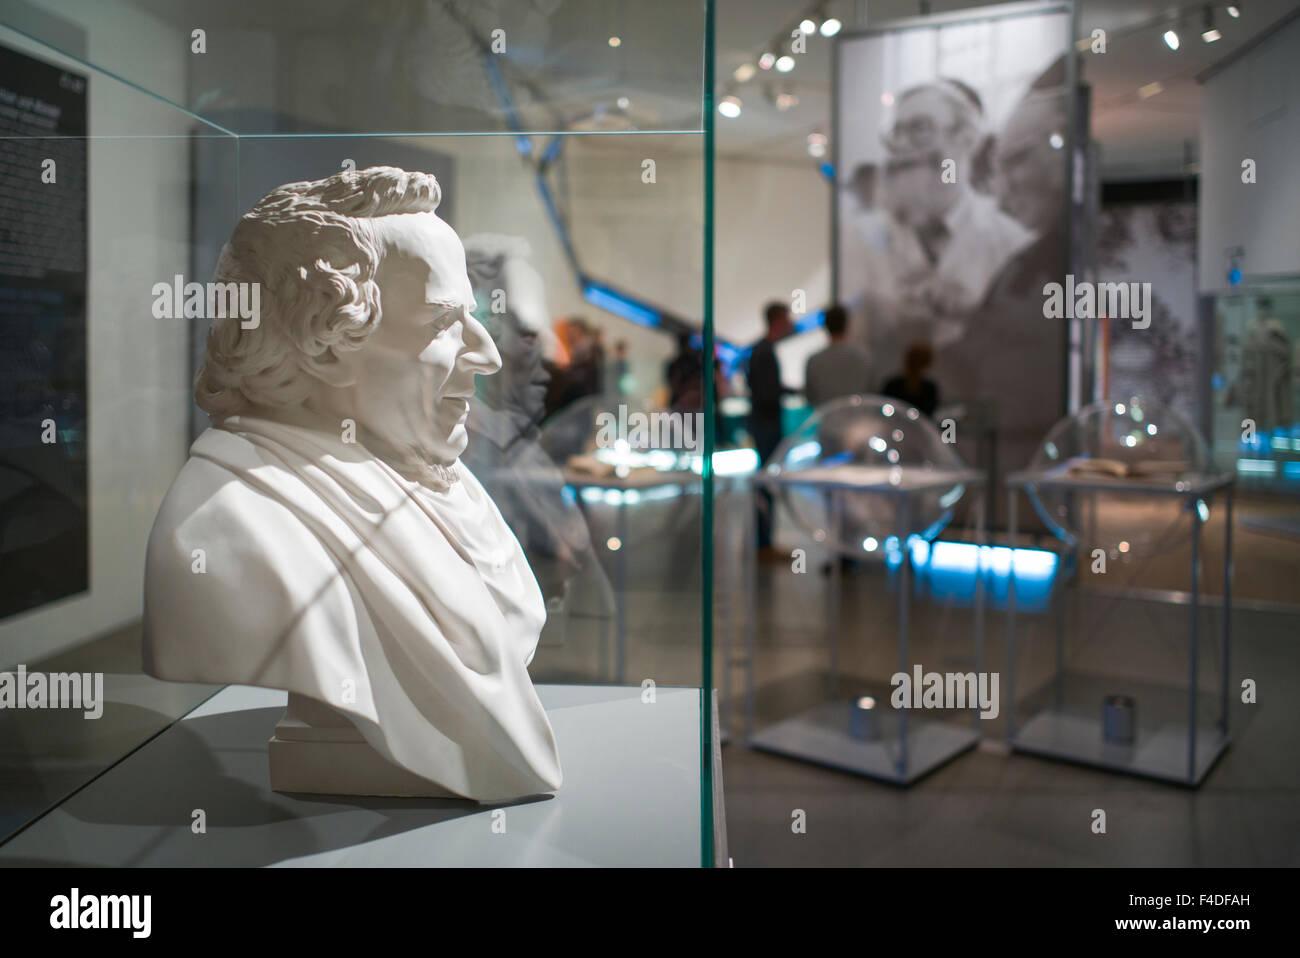 Germany, Berlin, Kreuzberg, Jewish Museum Berlin, Daniel Libeskind, architect, New Building, bust of Moses Mendelssohn, - Stock Image